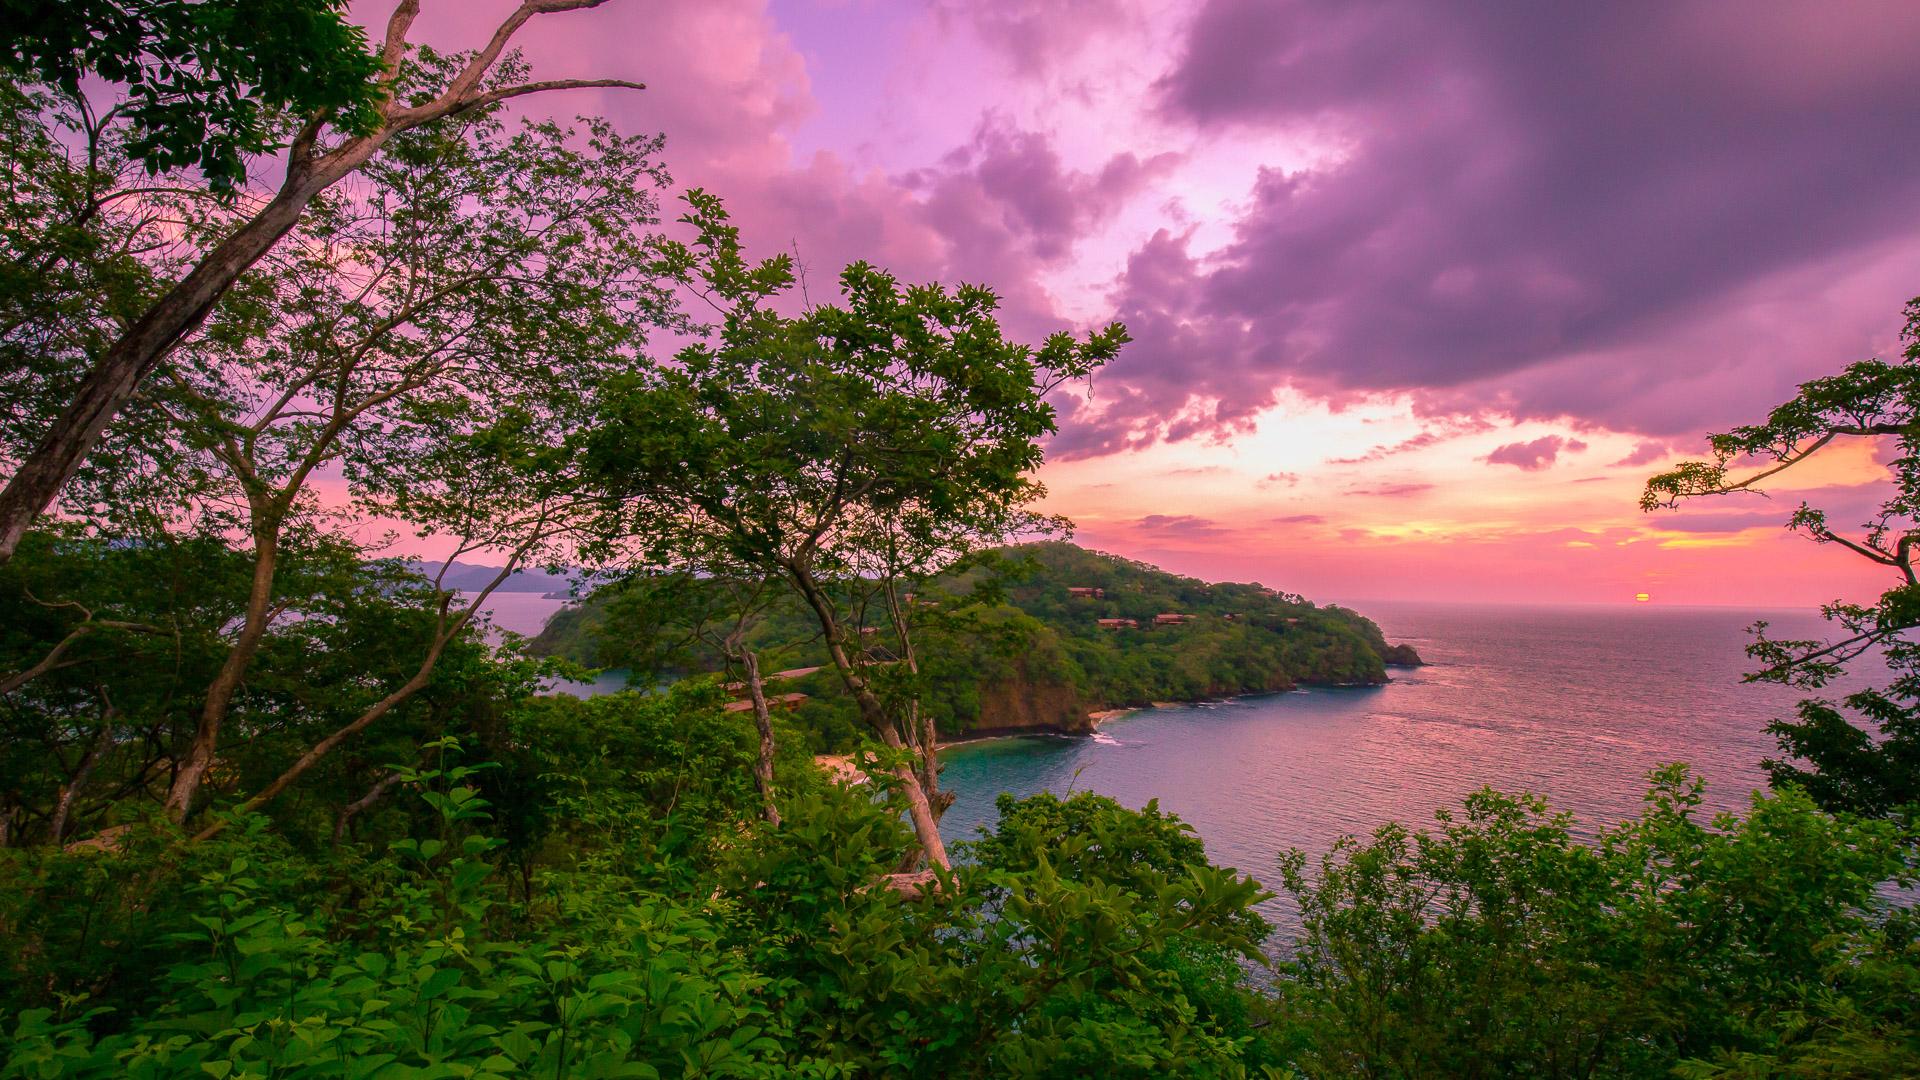 A shot of beautiful sunset over Coast Rica coastline.